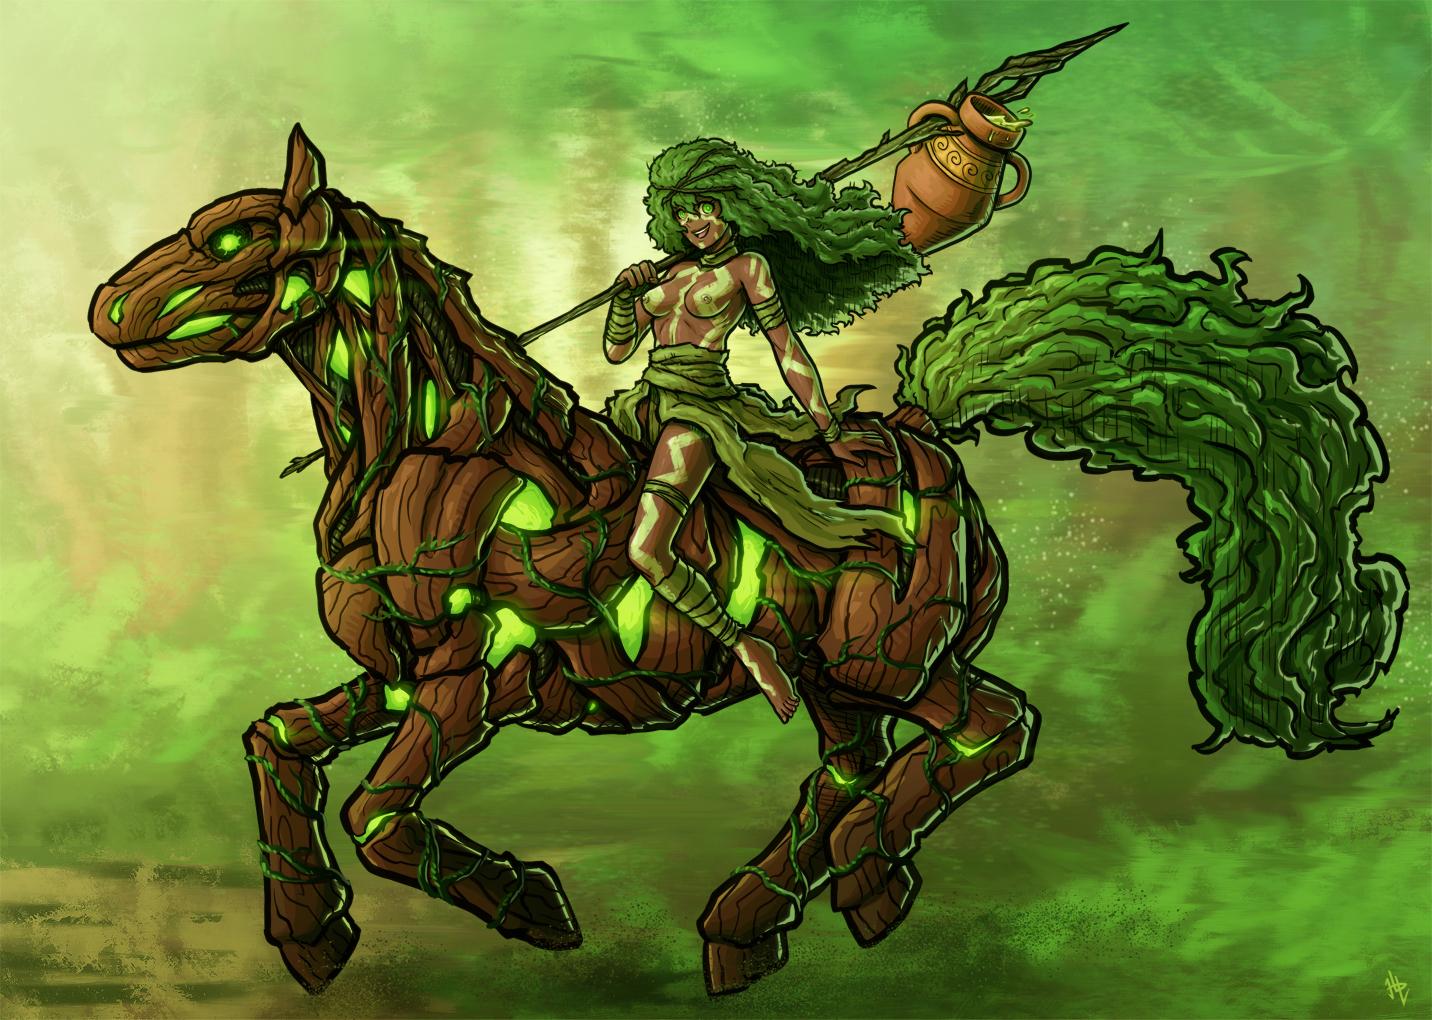 Green Rider of Life